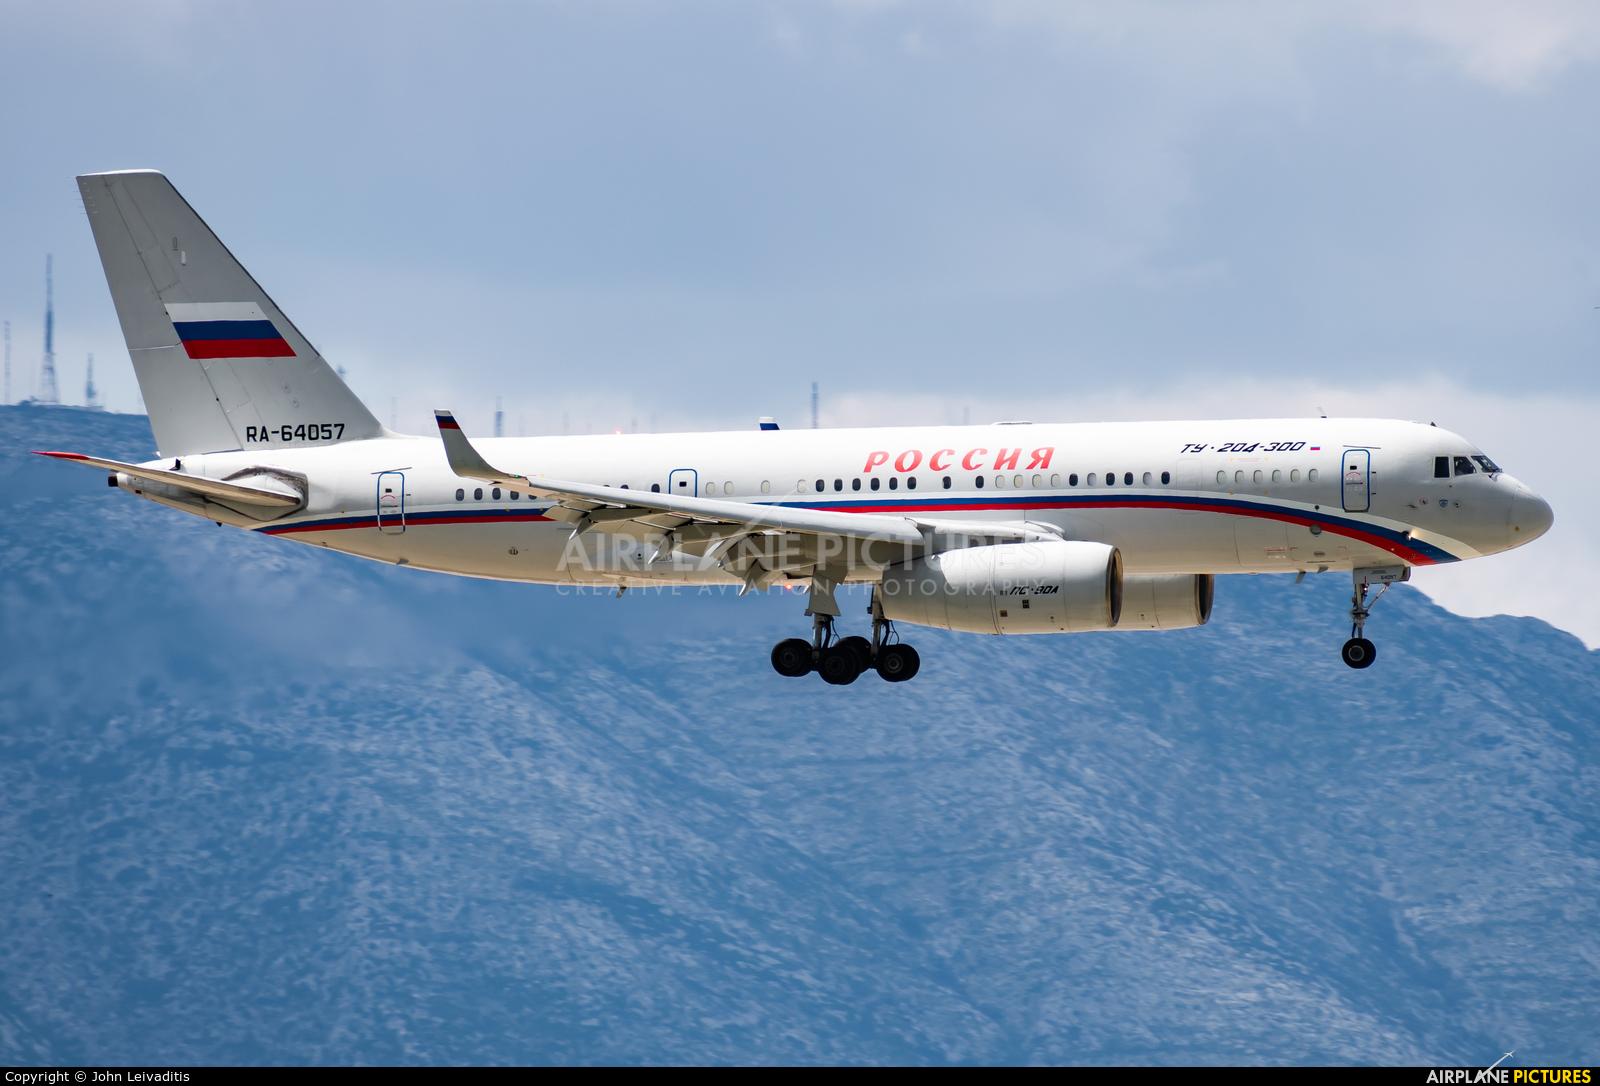 Rossiya RA-64057 aircraft at Athens - Eleftherios Venizelos